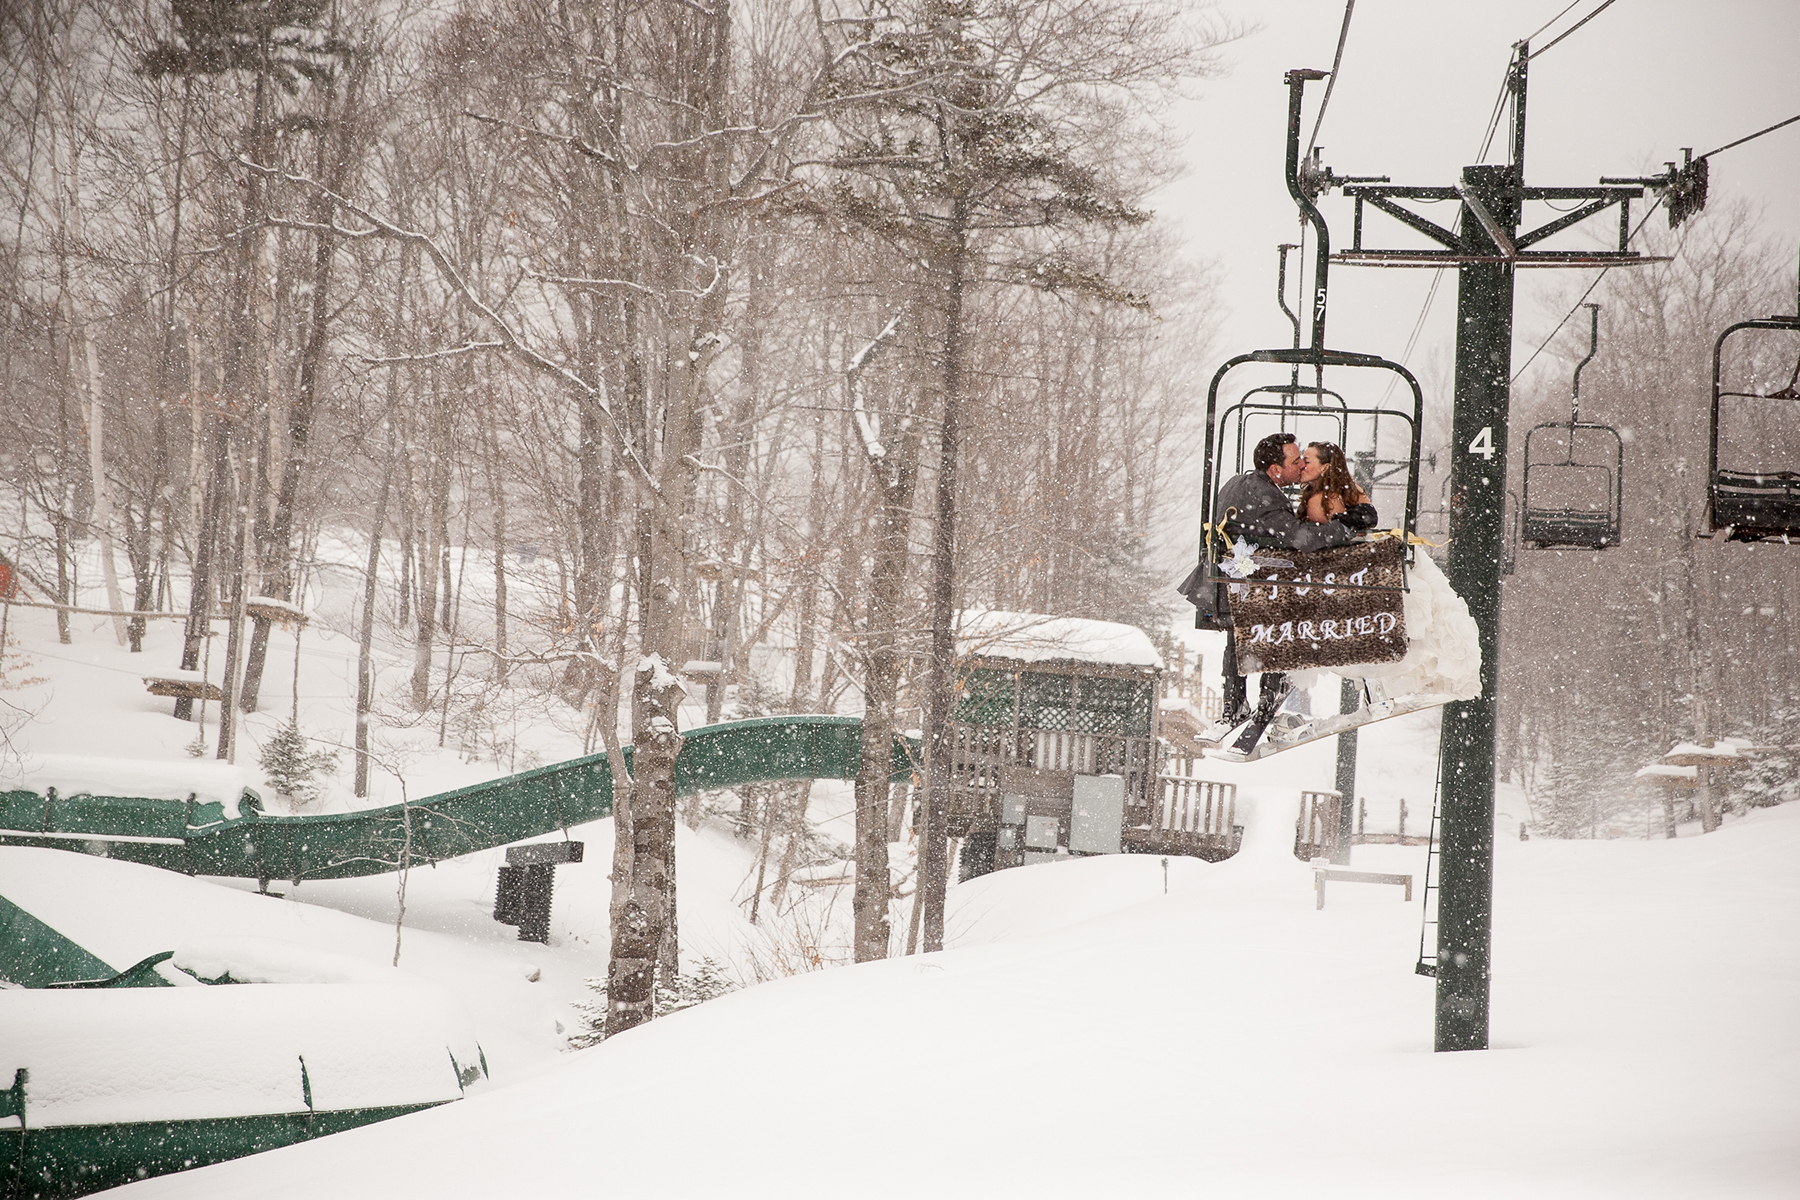 Couple Kissing on Ski Lift